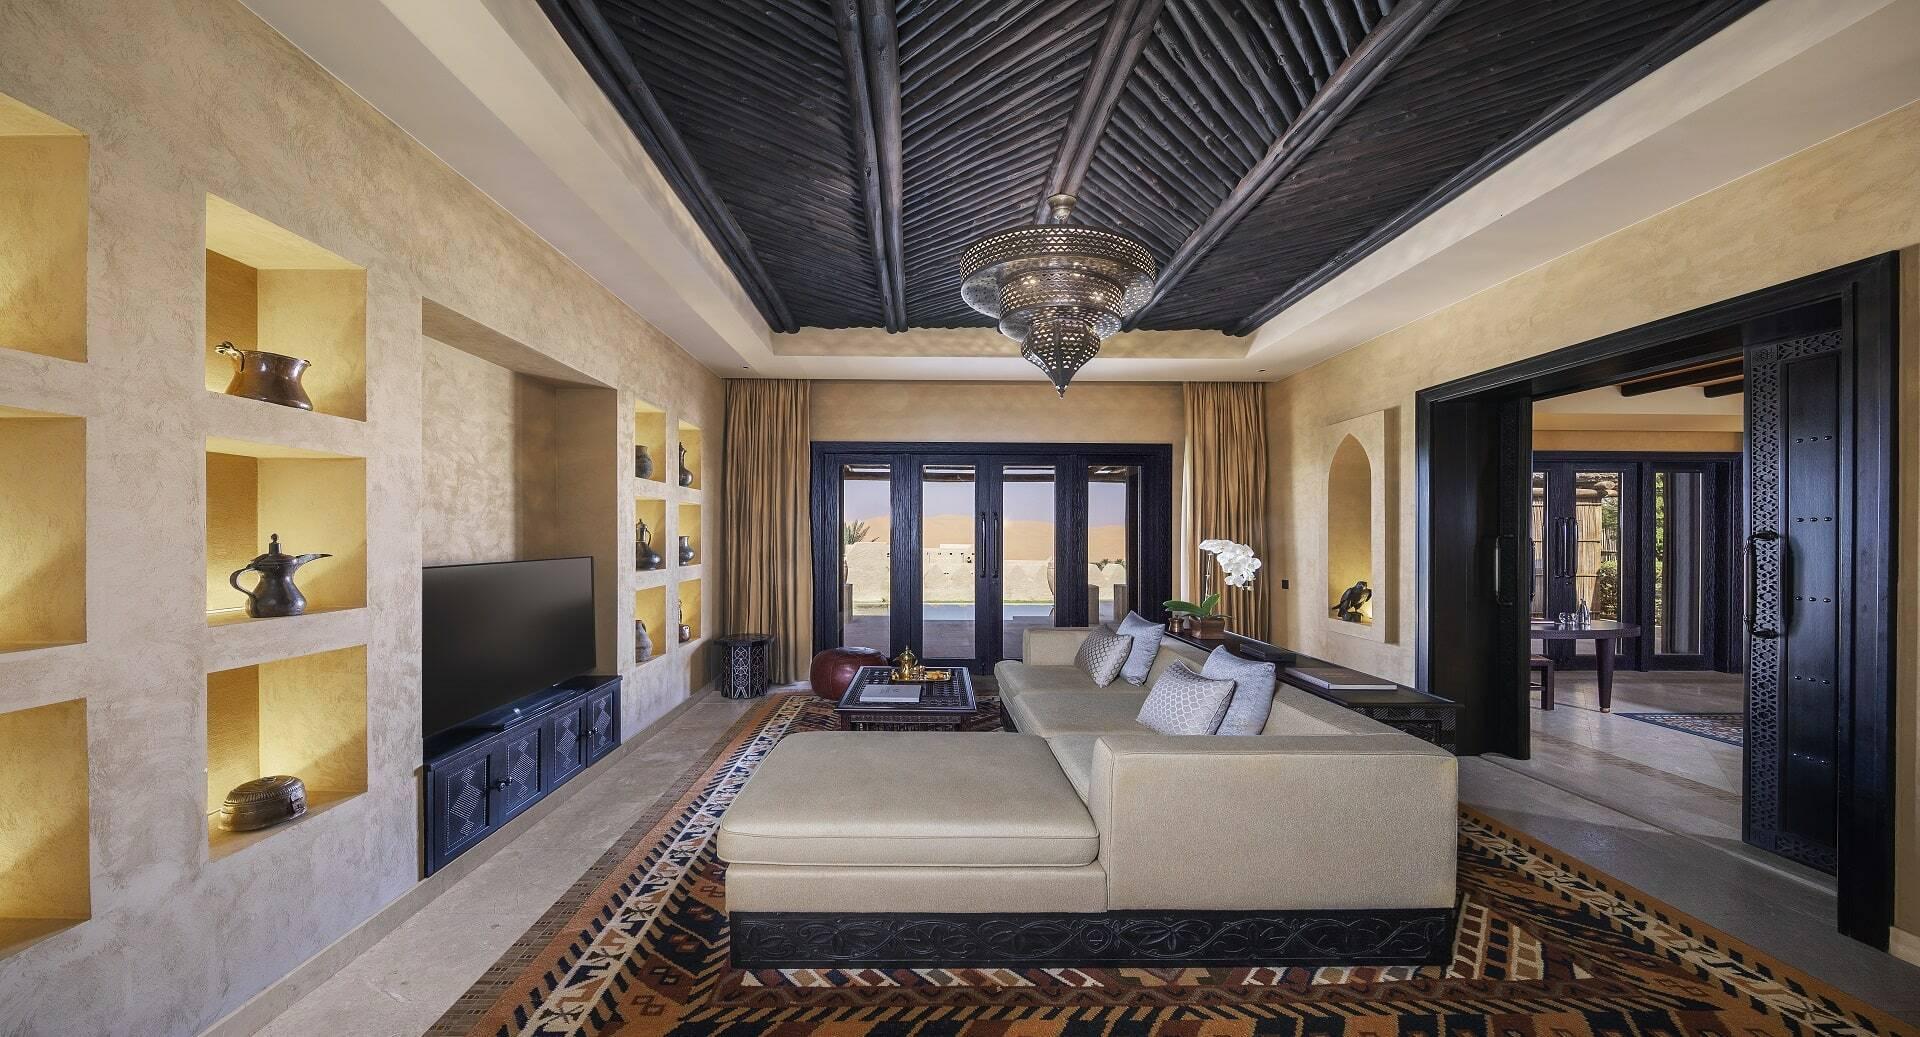 Abu Dhabi Anantara Qasr al Sarab Desert guest room one bedroom villa